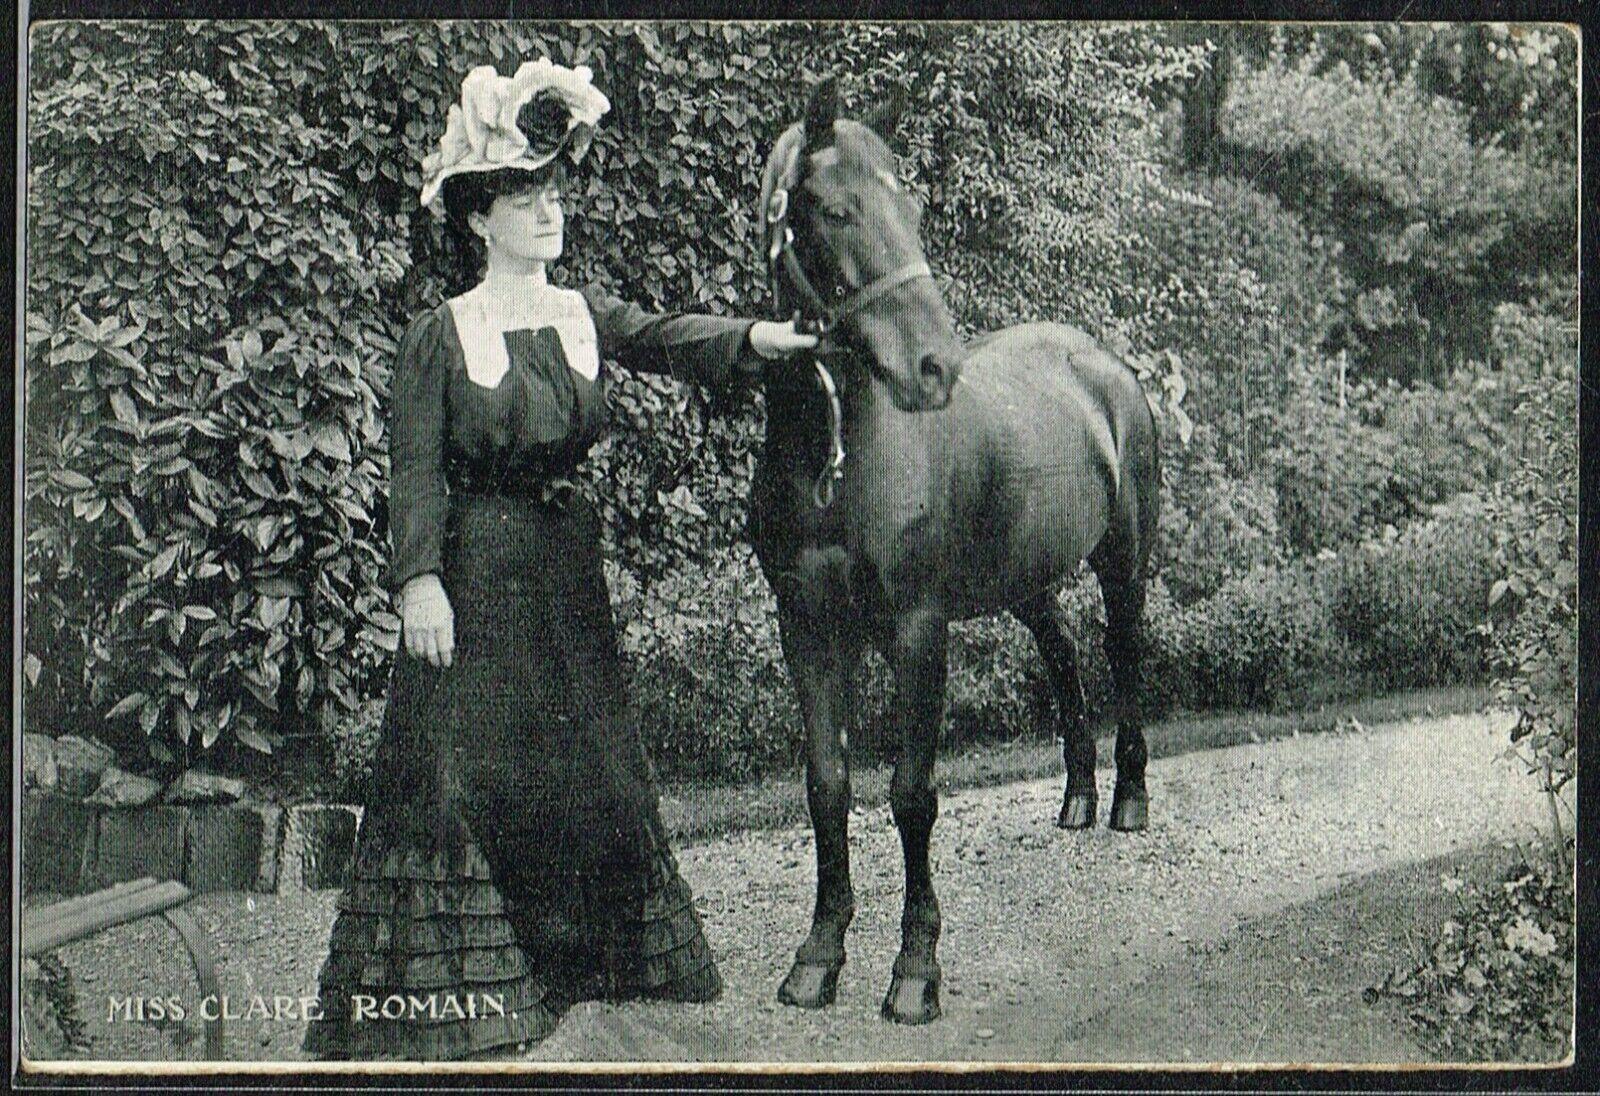 Image 361 - ☆ EDWARDIAN THEATRE / MUSIC HALL ACTRESS / DANCER ☆ 1900s Postcards LIST 38